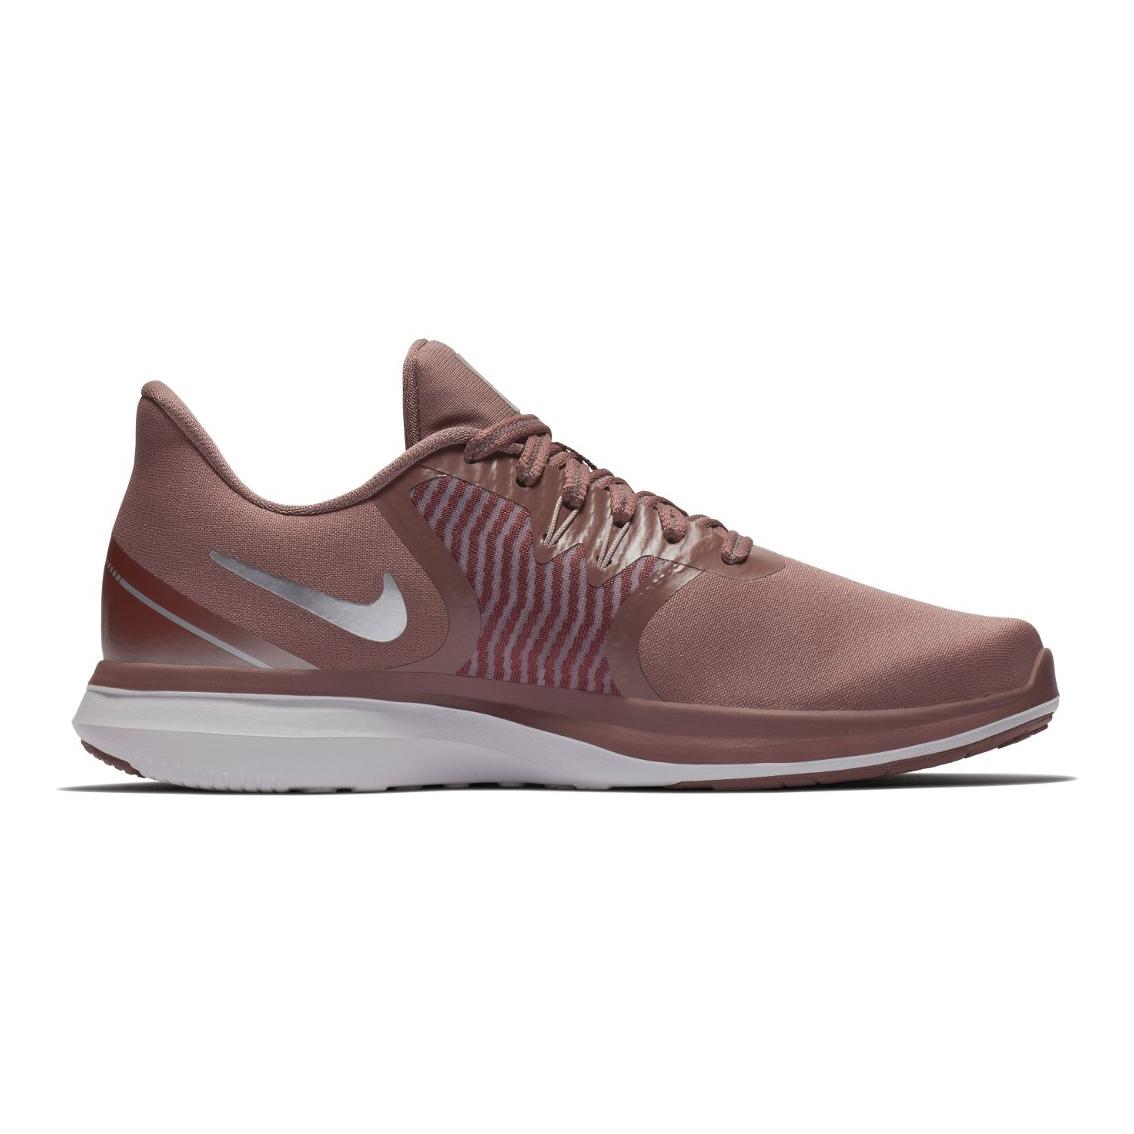 3a4789a526b2 Nike Women s In-Season TR 8 Print Training Shoes- Smokey Mauve ...